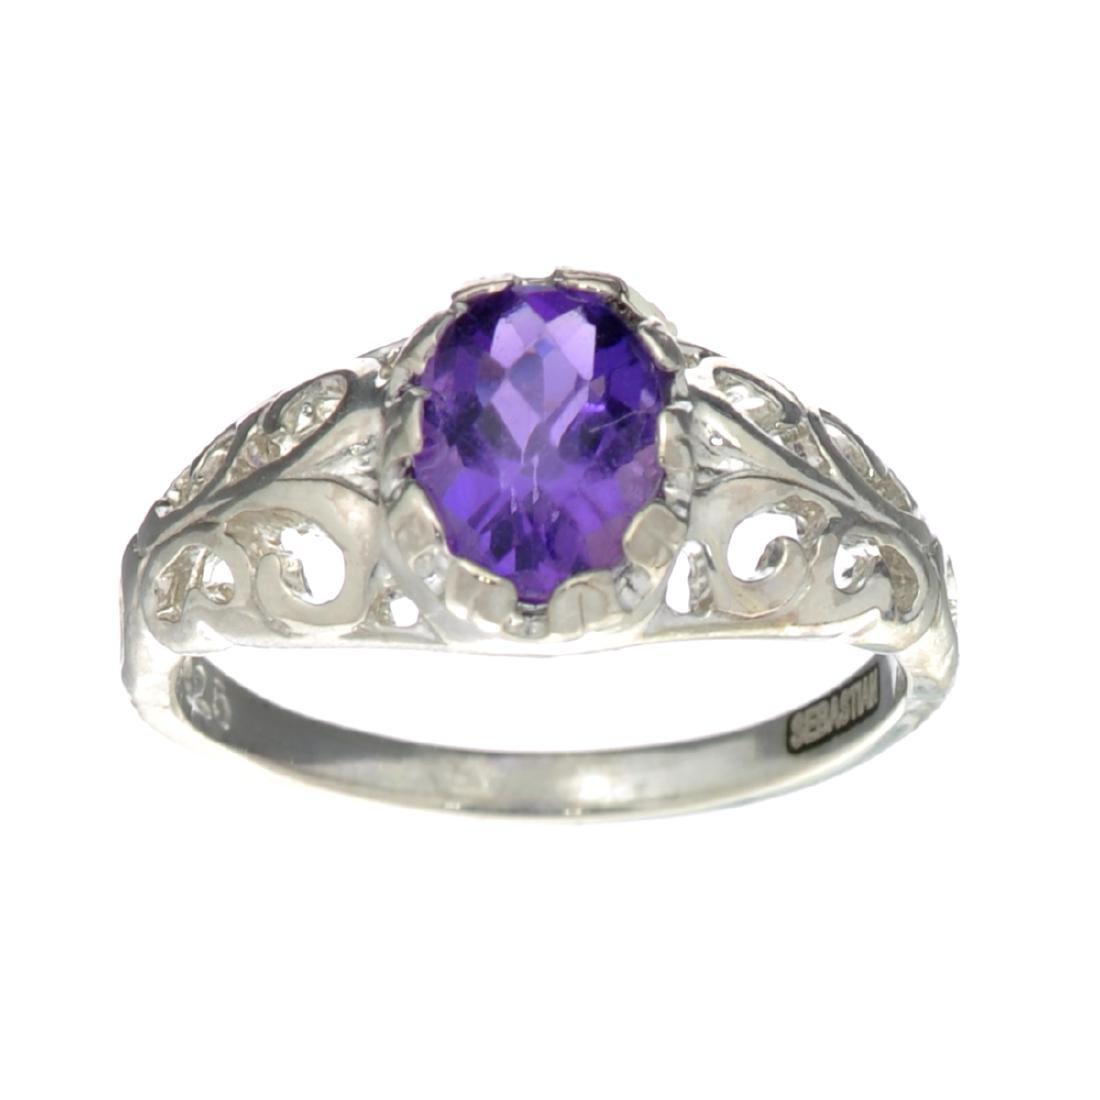 APP: 0.5k Fine Jewelry Designer Sebastian, 1.37CT Oval